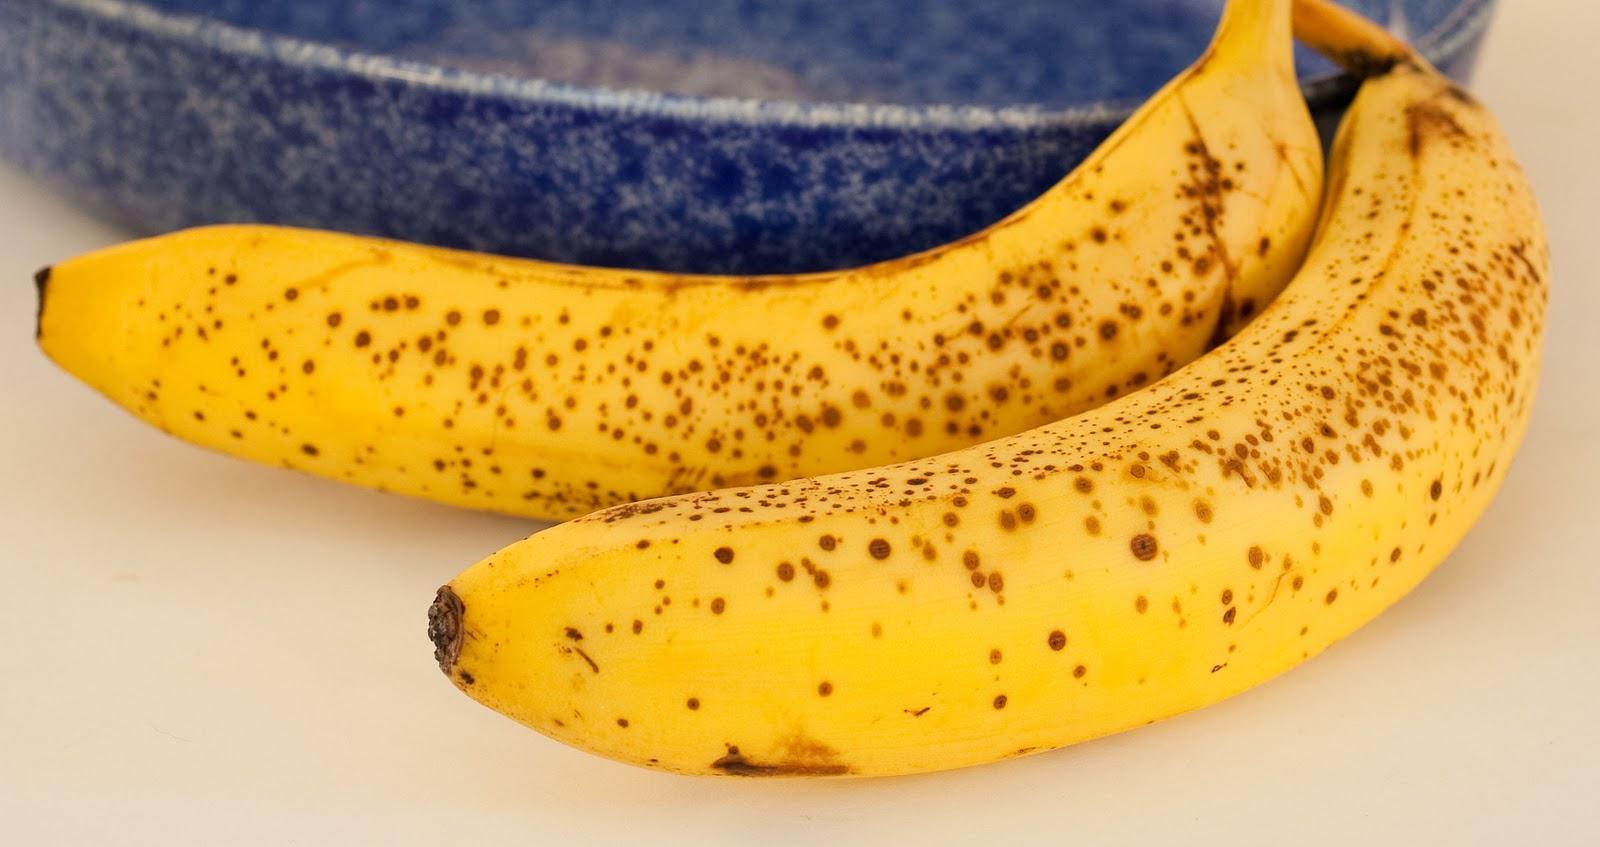 Tish Boyle Sweet Dreams: Roasted Banana Muffins